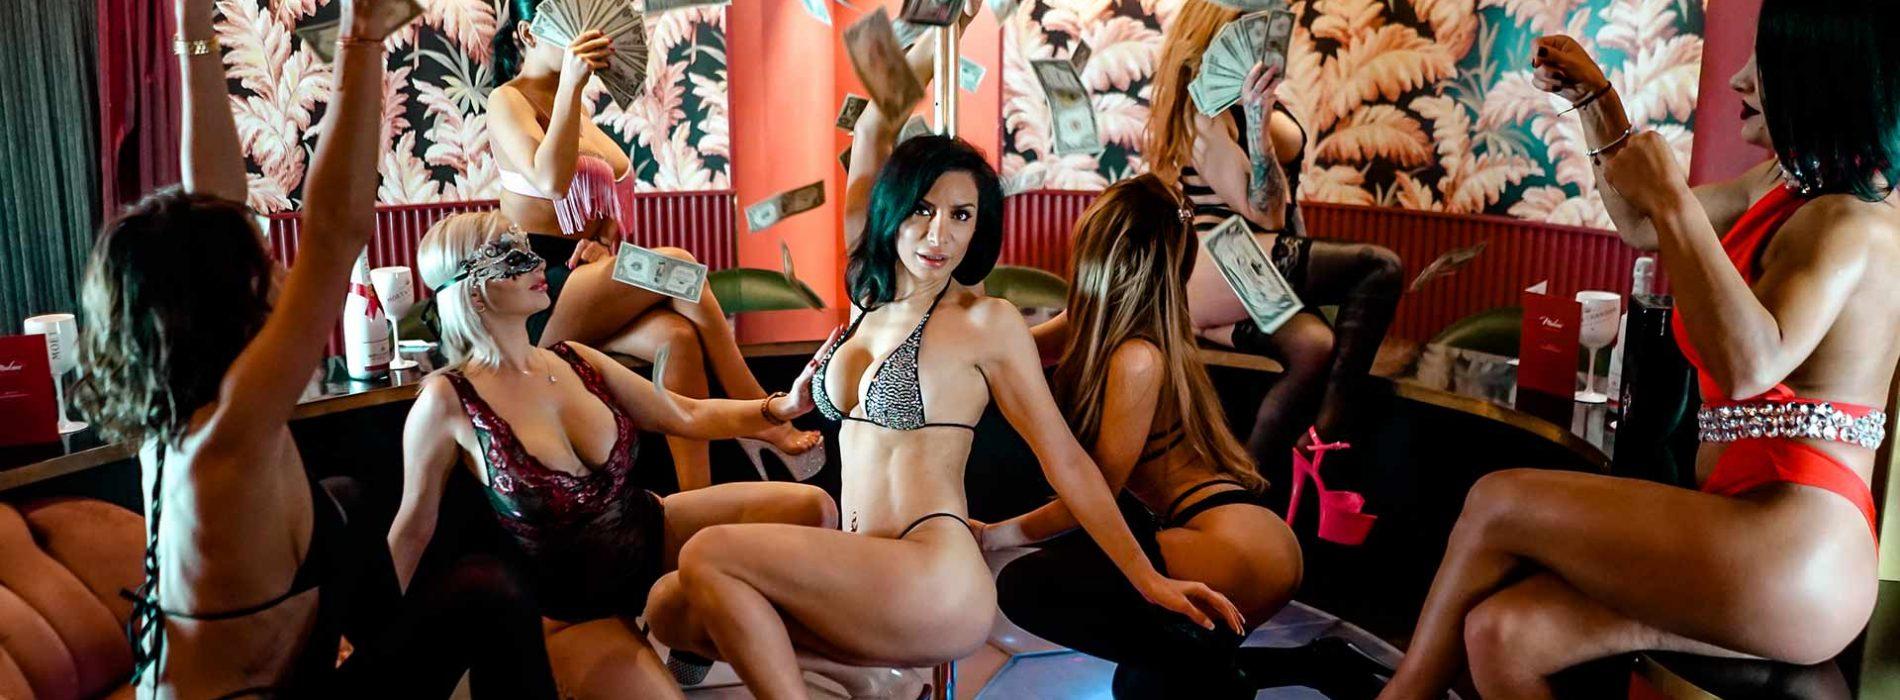 Madam Strip Club